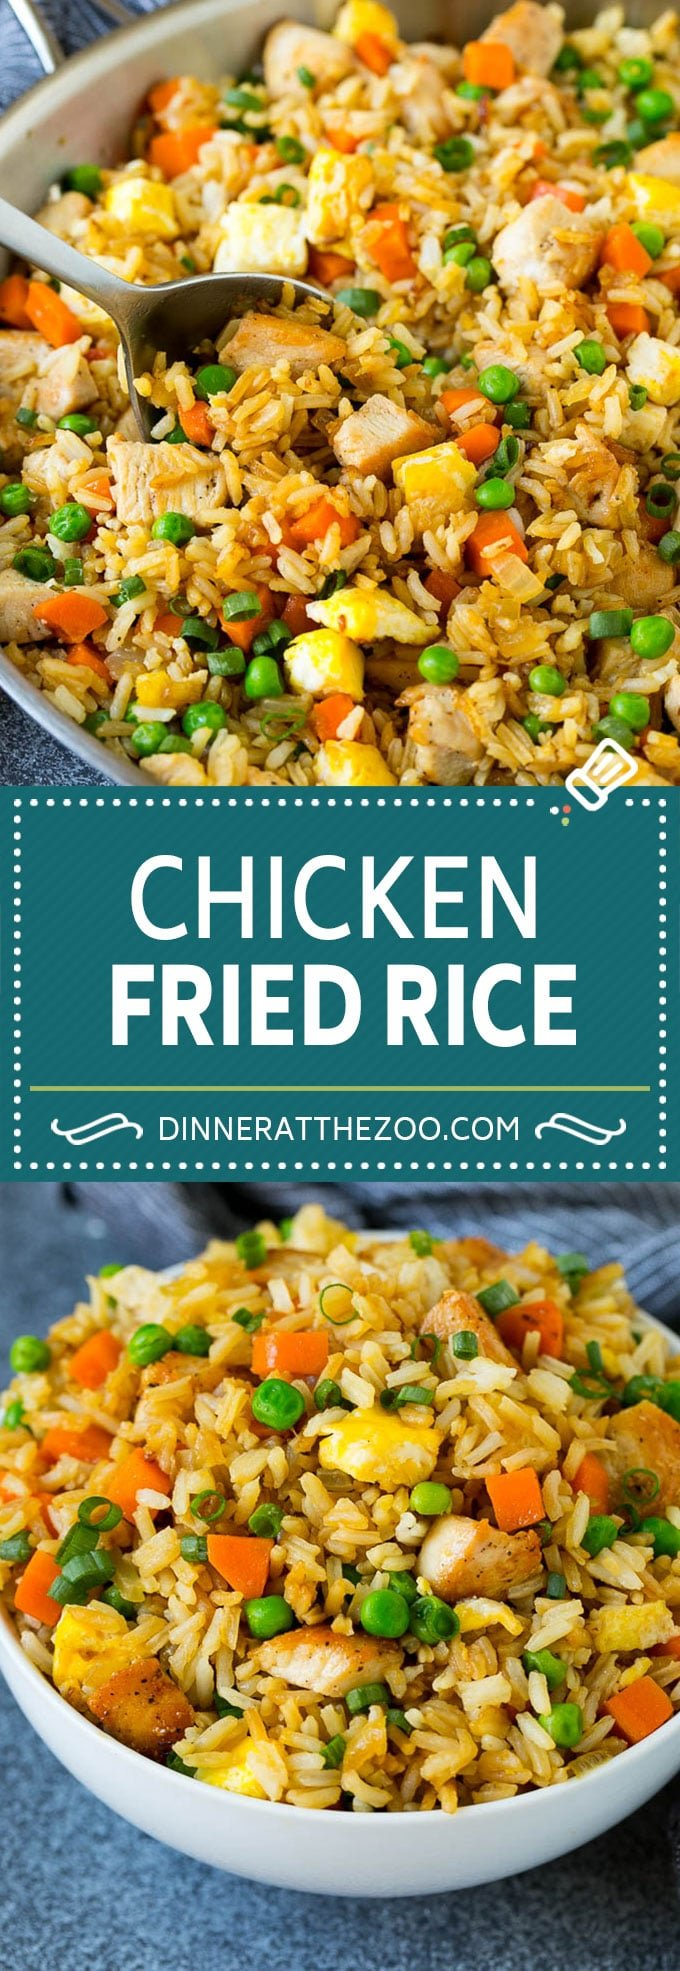 Chicken Fried Rice Recipe   Chinese Fried Rice #rice #chicken #peas #carrots #sidedish #dinner #dinneratthezoo